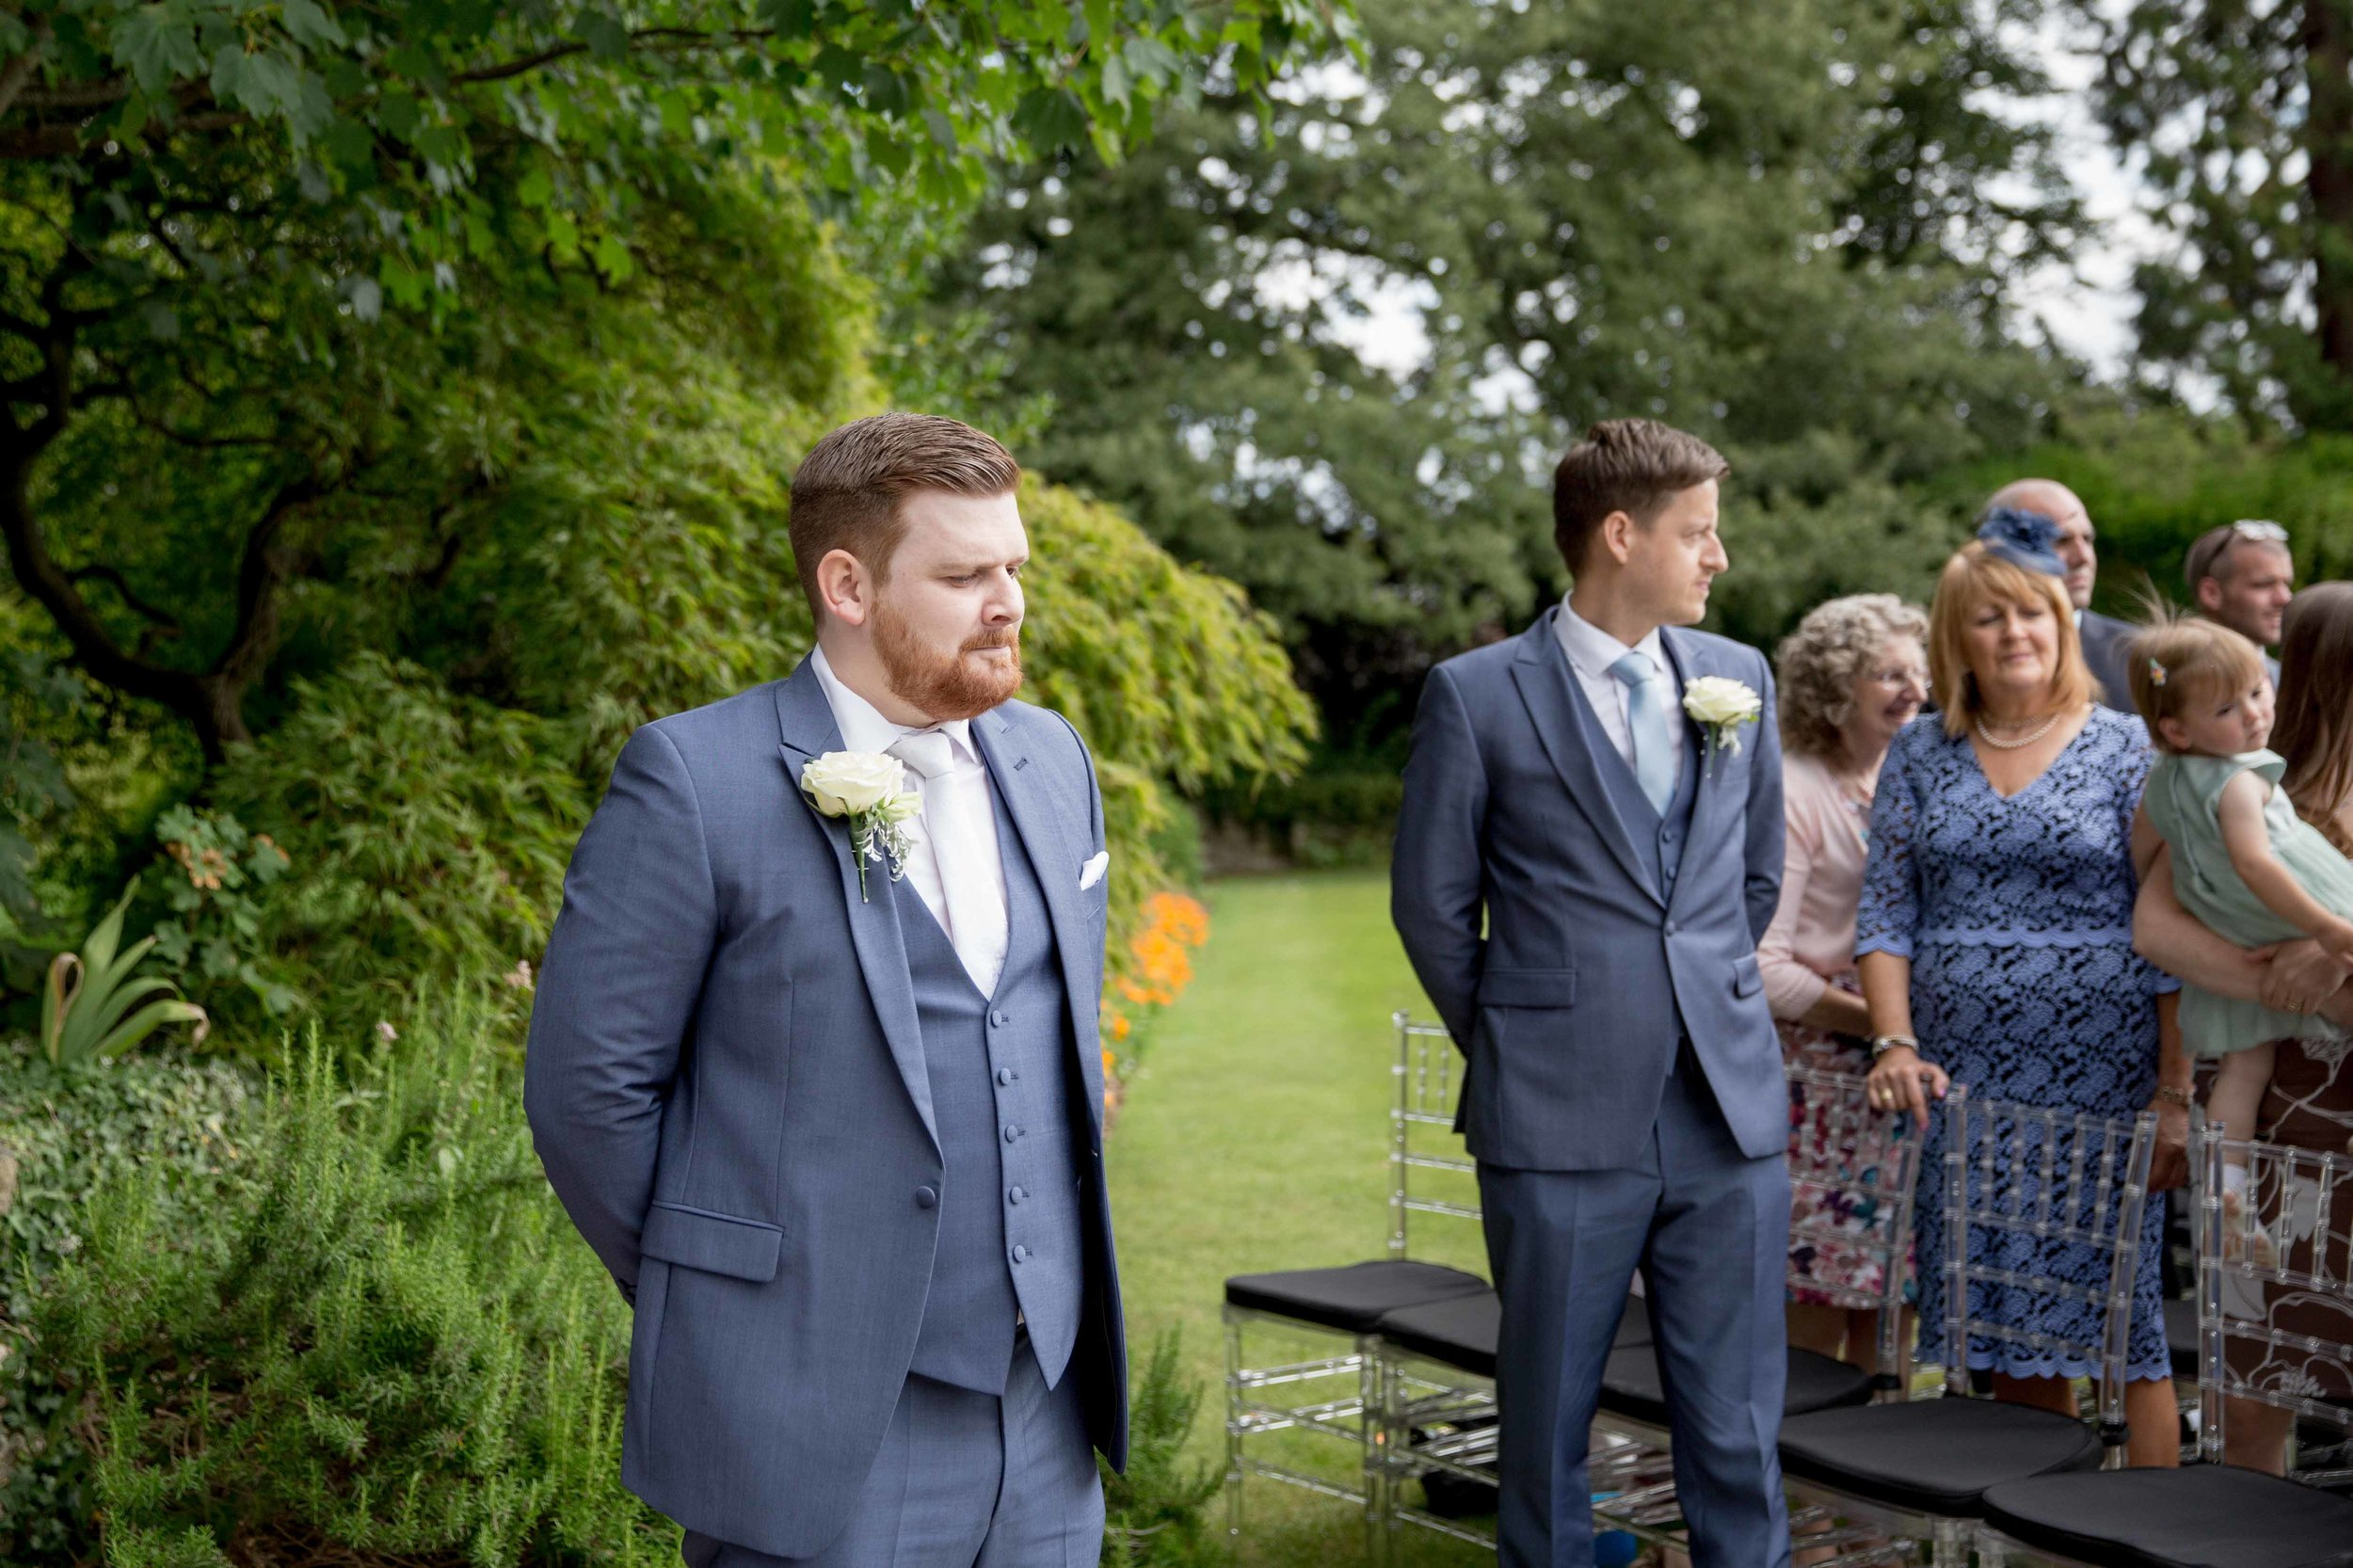 cotswold-wedding-photography-at-stonehouse-court-hotel-natalia-smith-photography-gloucestershire-wedding-photographer-11.jpg